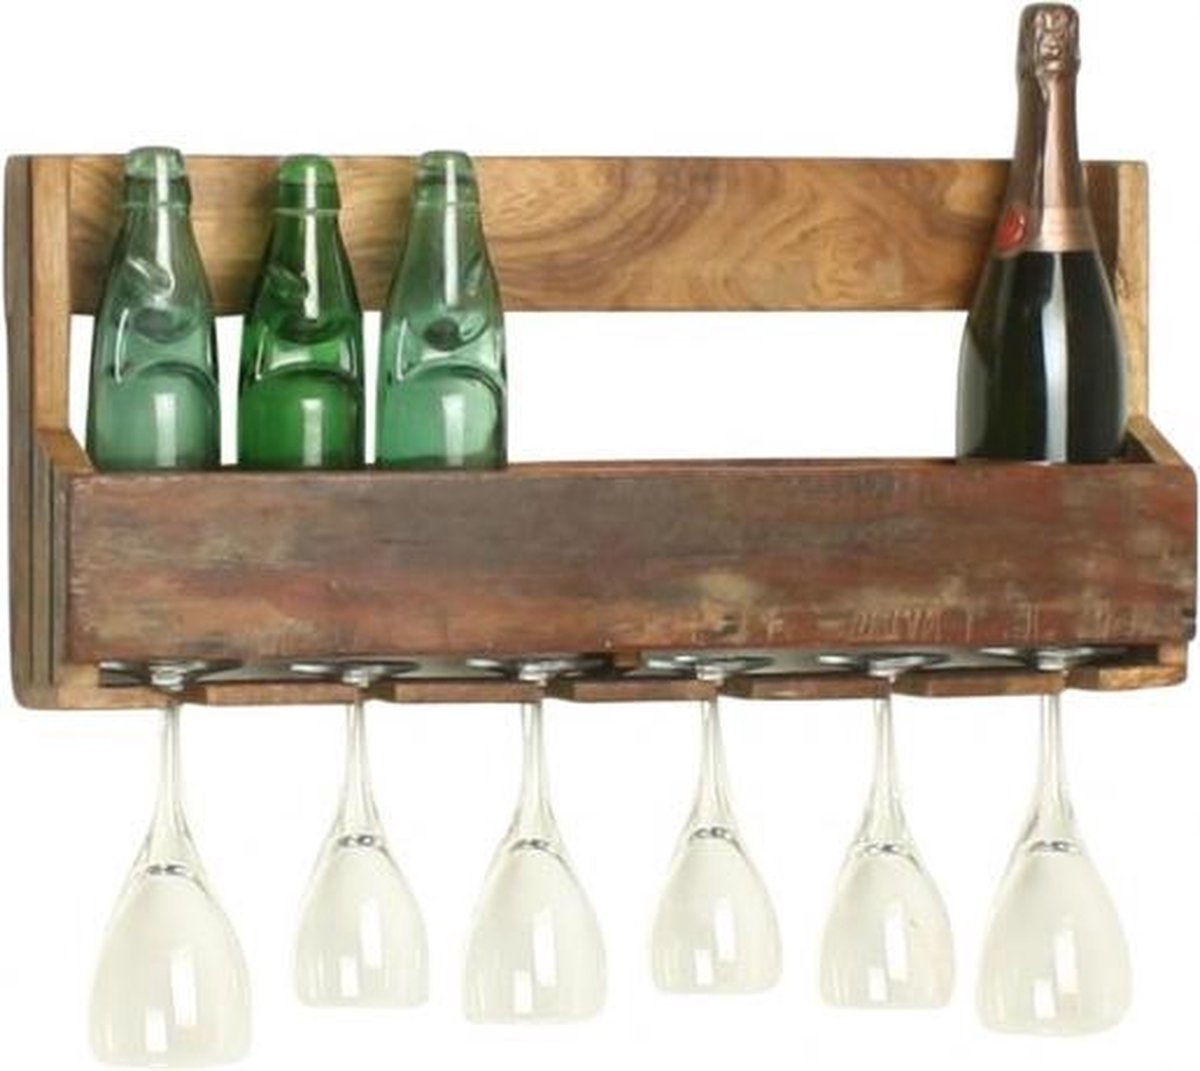 Raw Materials Factory Wijnrek - 60 x 12 x 28 cm - Hangend - Gerecycled hout - 5 flessen, 6 glazen